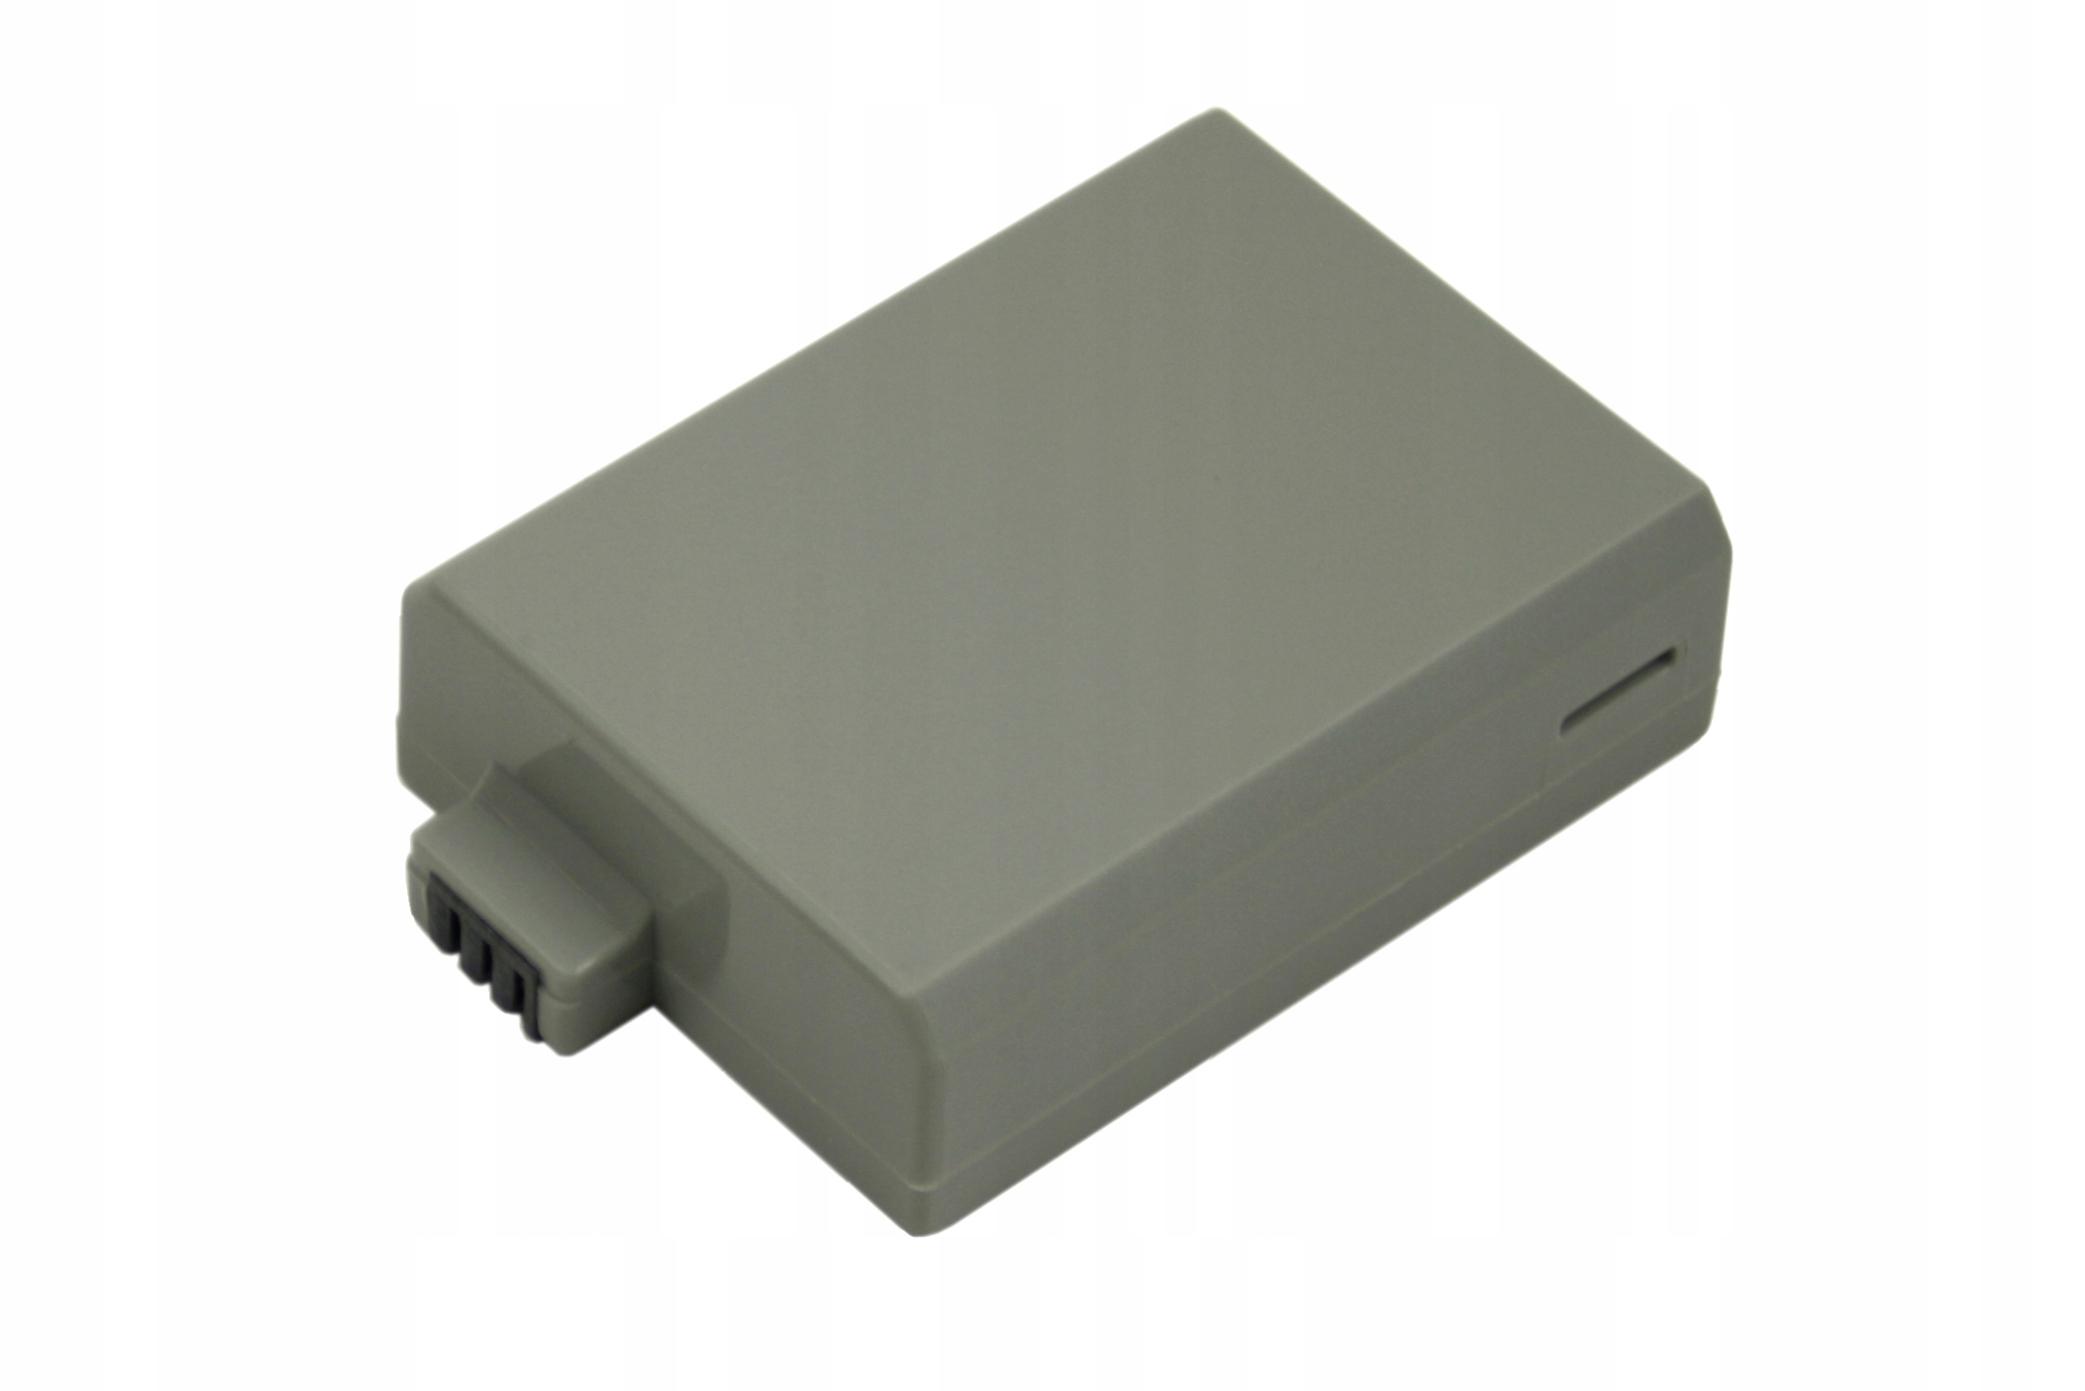 BATERIA AKUMULATOR CANON LP-E5 LPE5 EOS 500D 450D 1000D - Baterie do aparatów cyfrowych